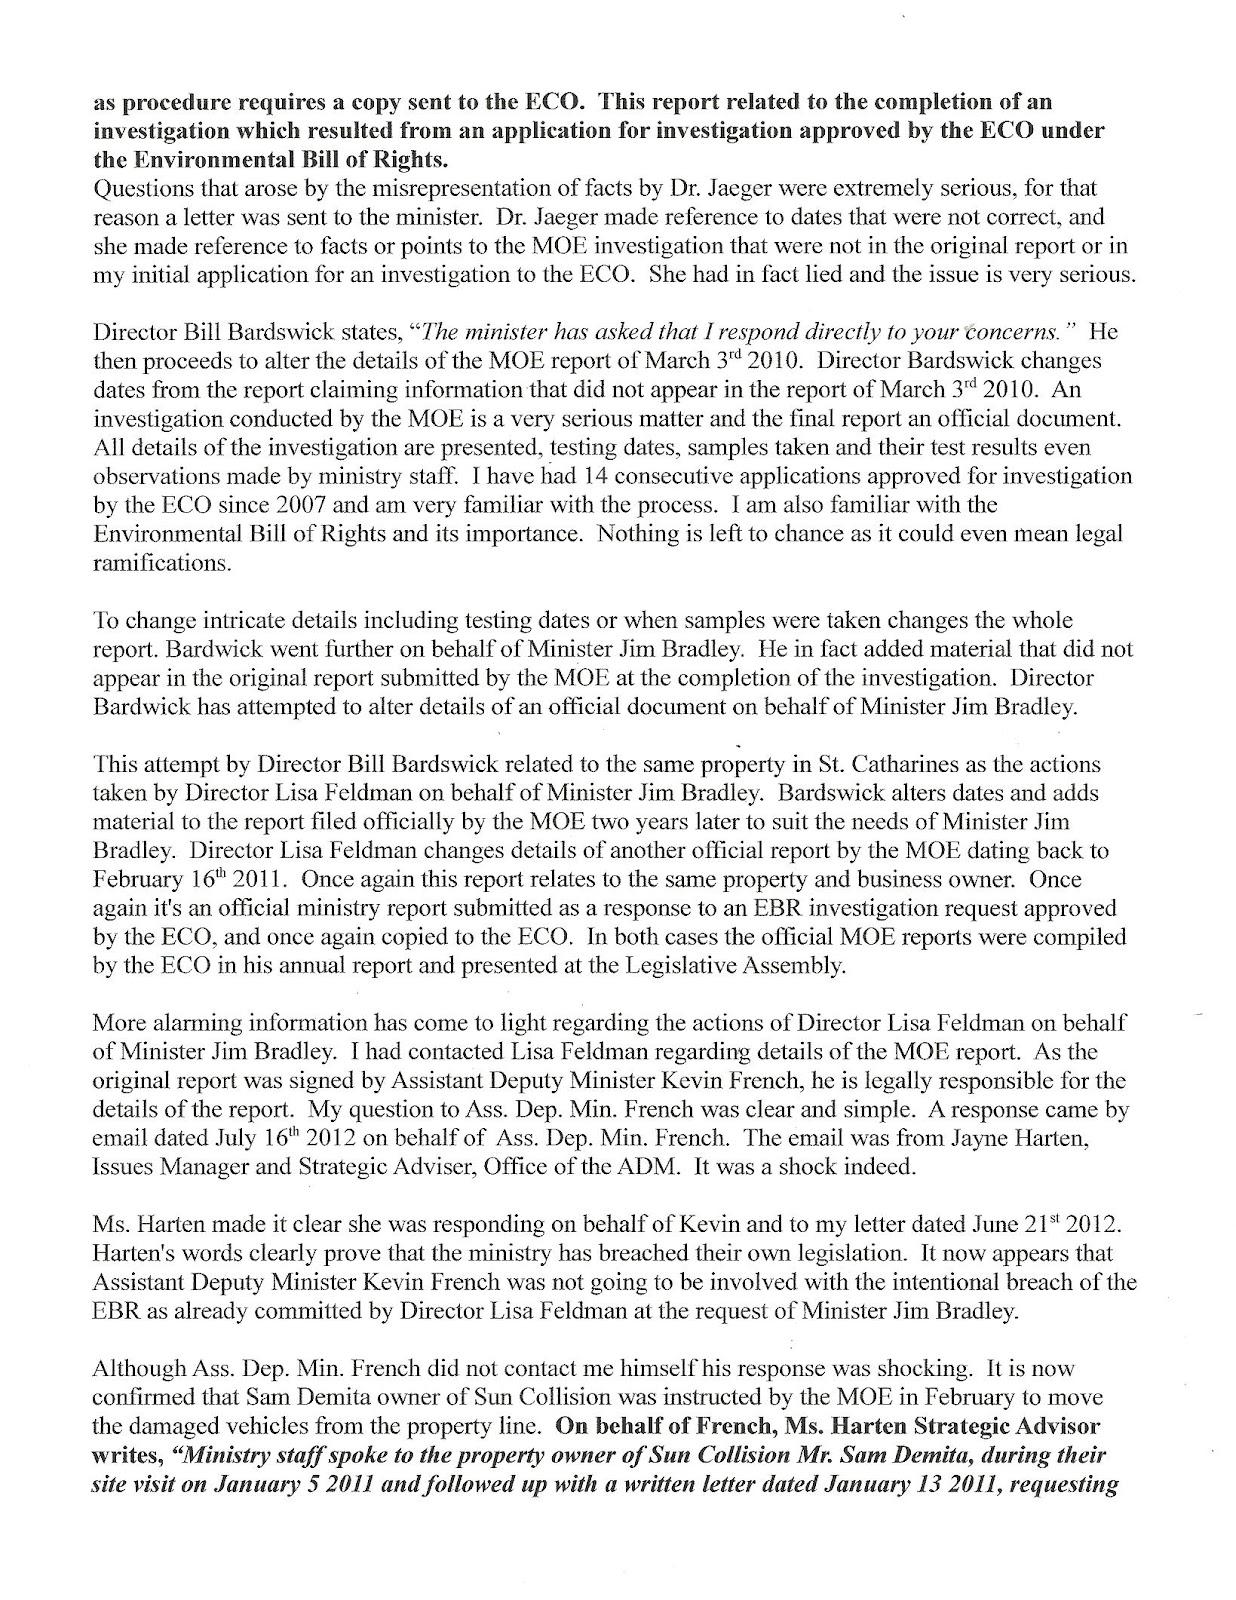 016 Ombudsmanletter2 Essay Example National Honor Society Sensational Application Junior Ideas Examples Full